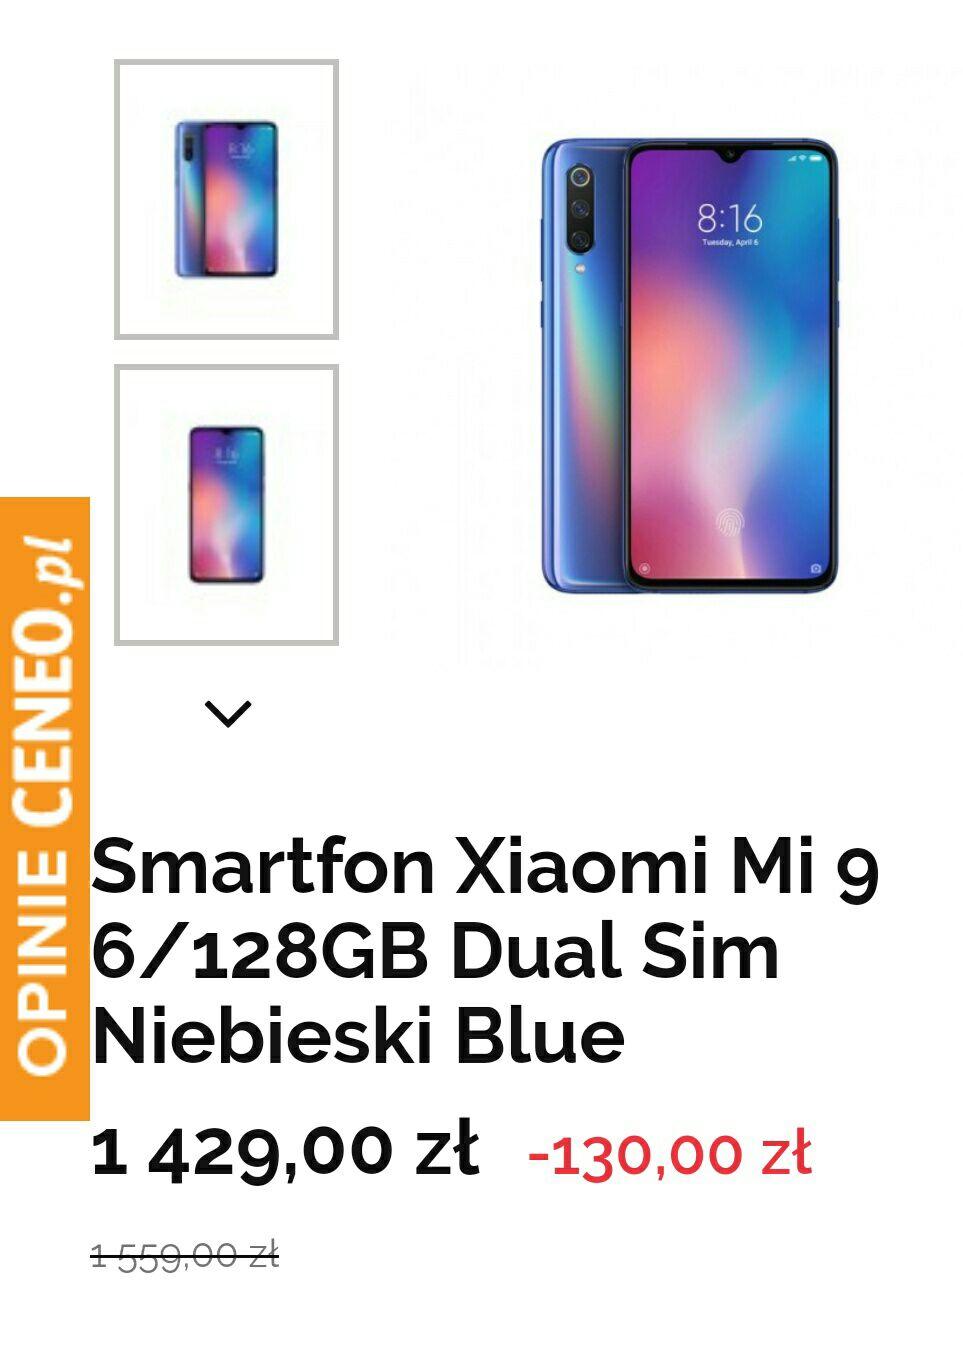 Xiaomi mi 9 6/128gb za 1429zl